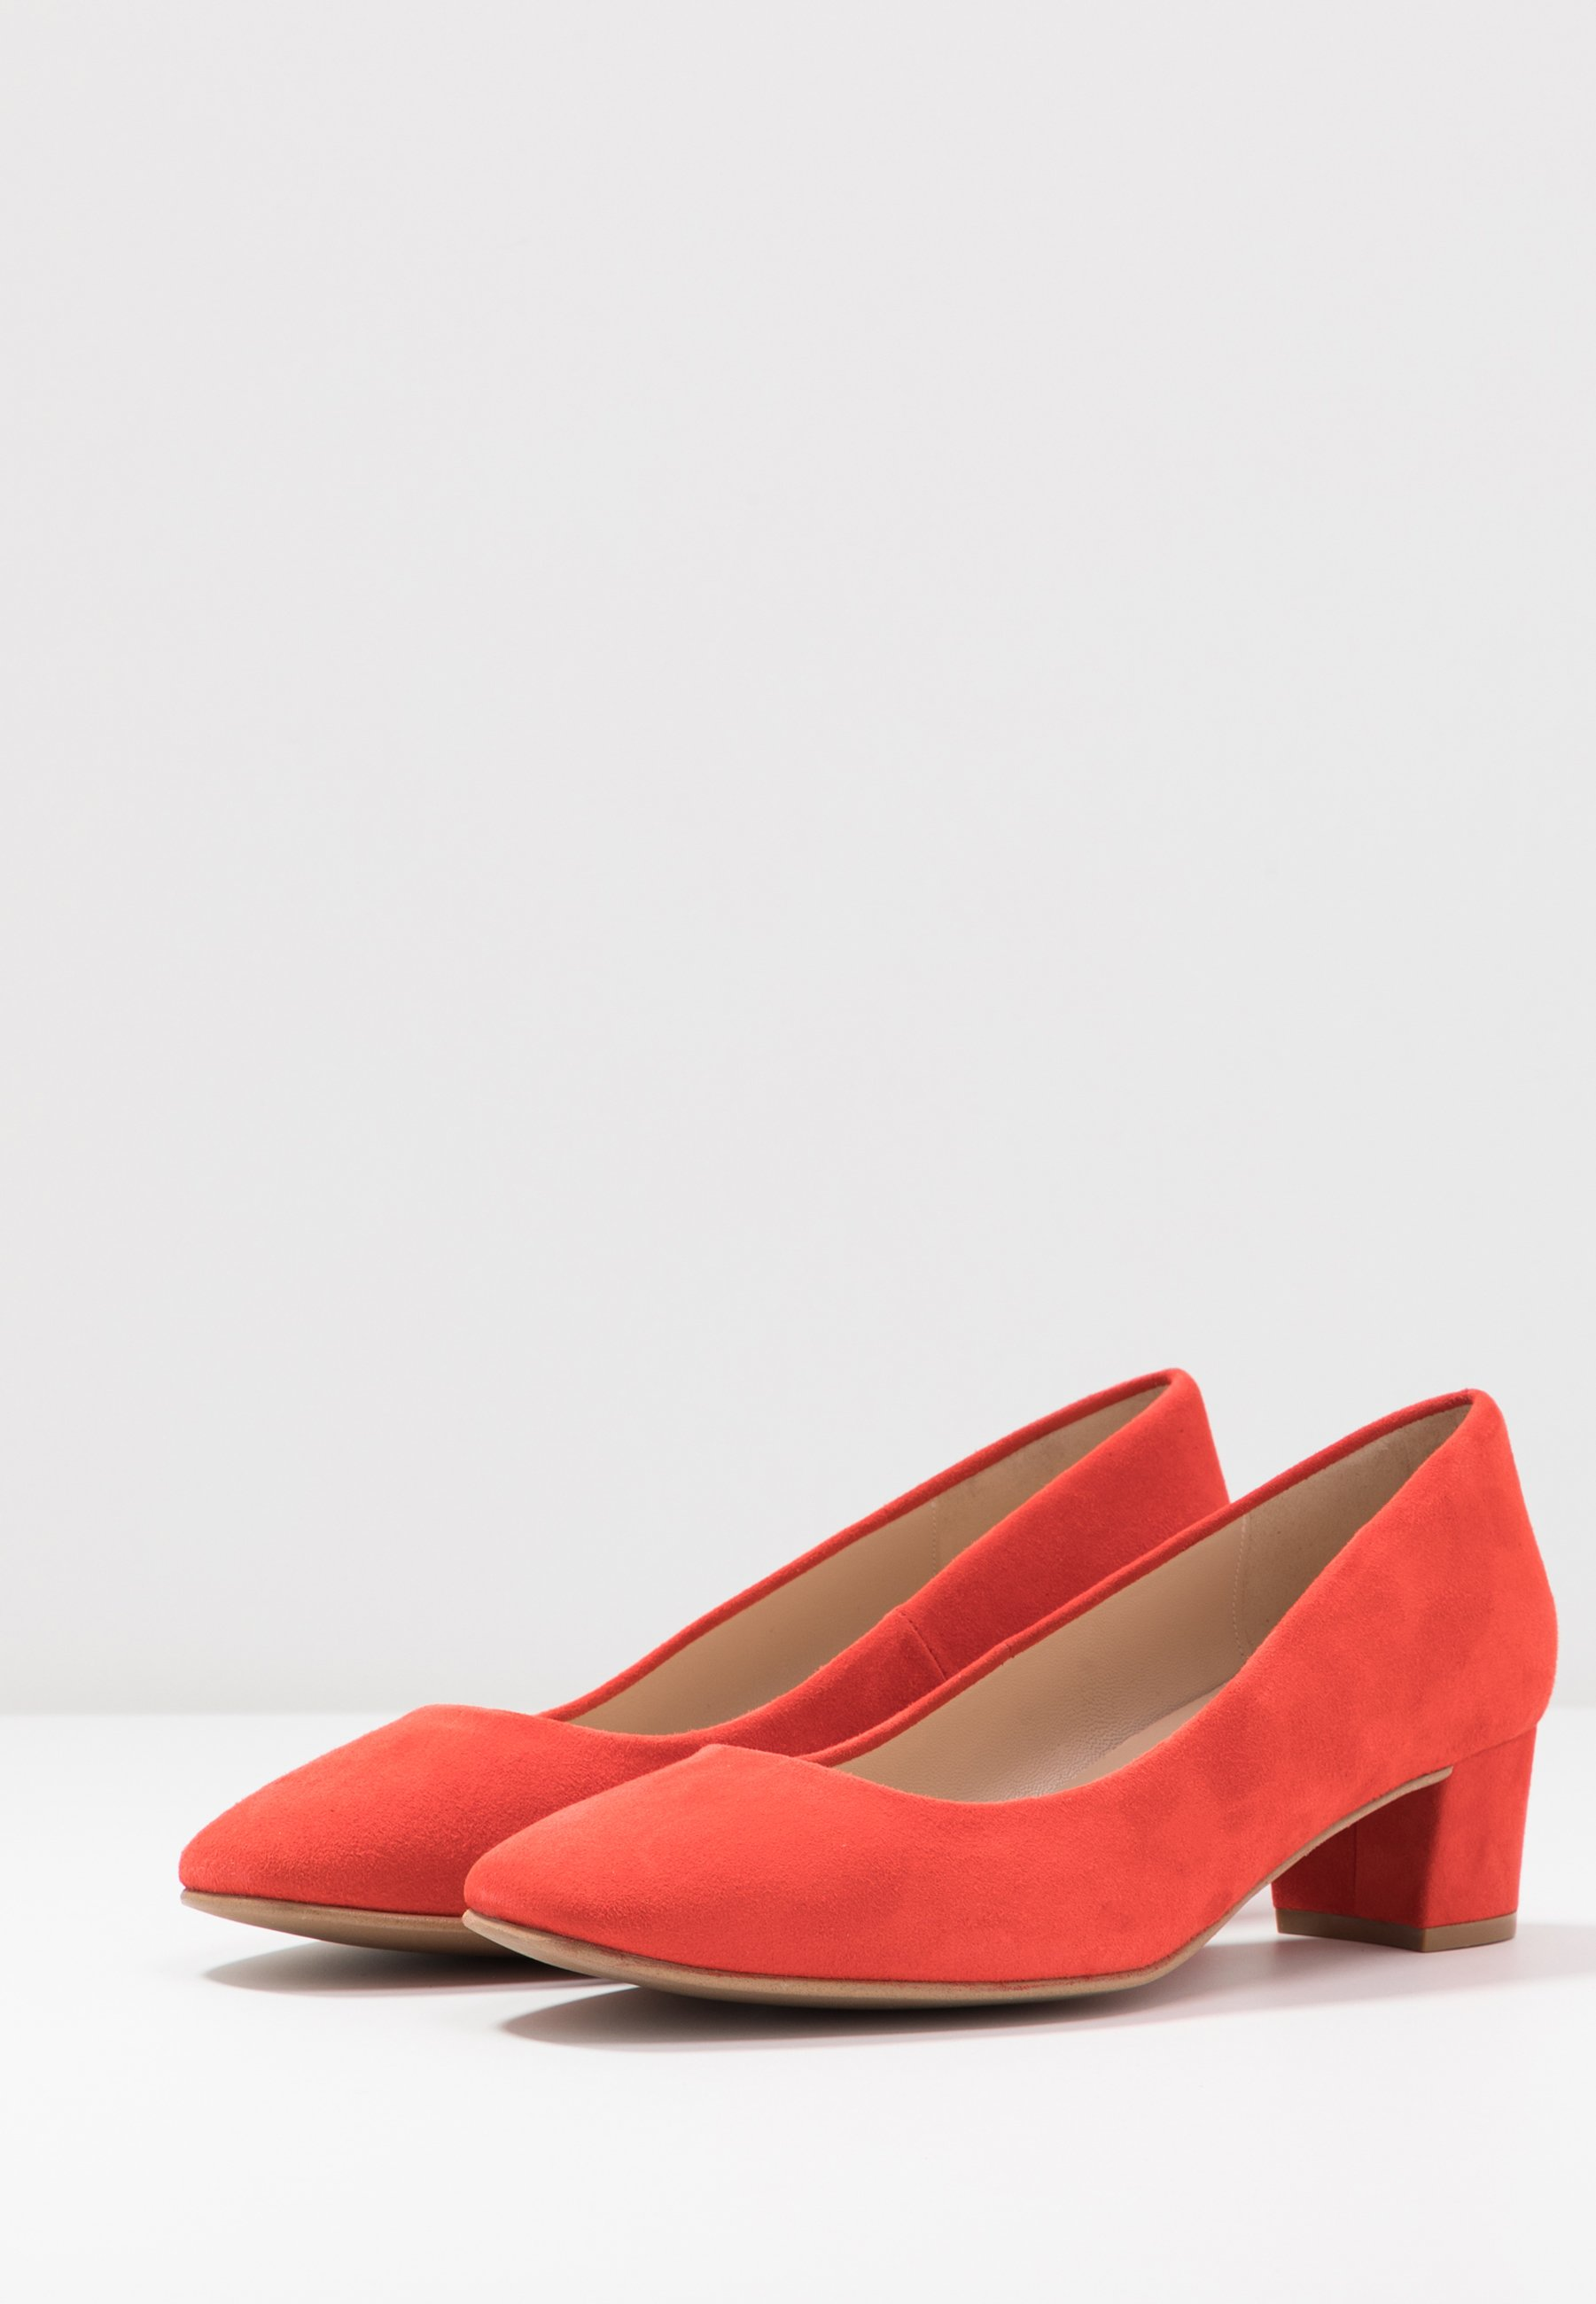 Brenda Zaro Wide Fit WIDE FIT AINARA - Escarpins - red pop - Chaussures à talons femme Pas cher